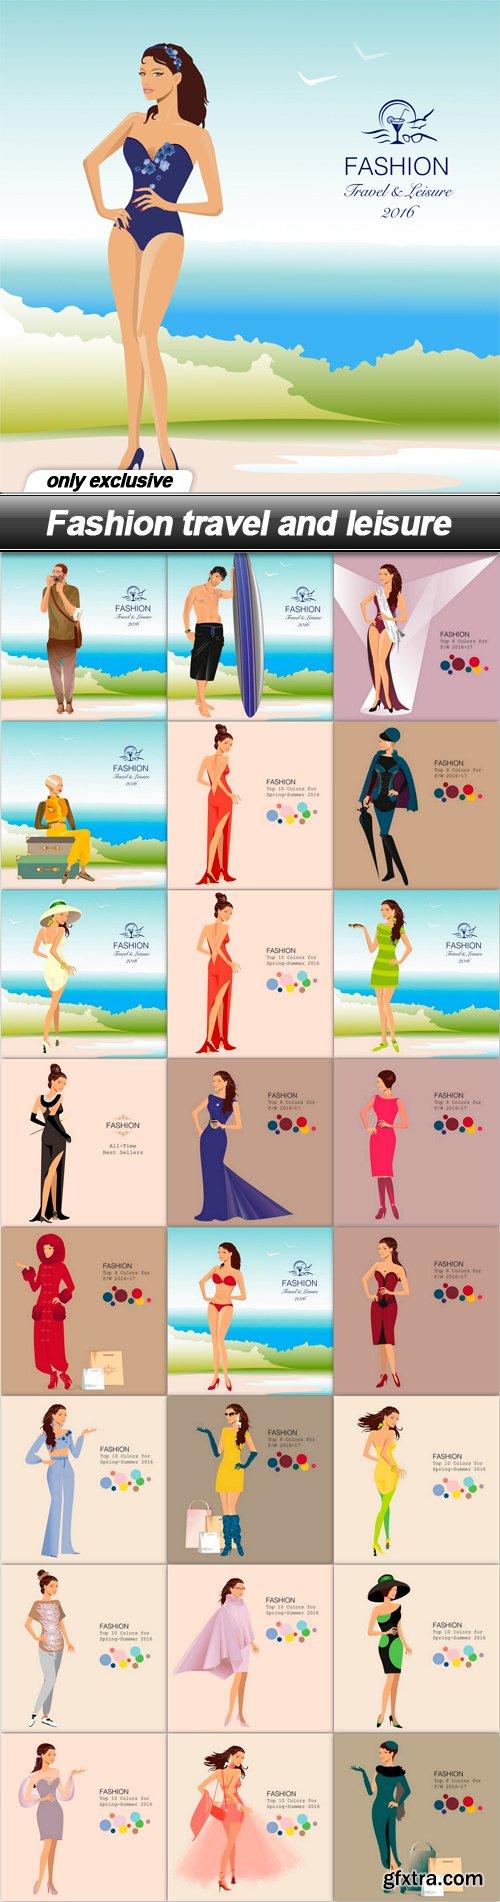 Fashion travel and leisure - 25 EPS